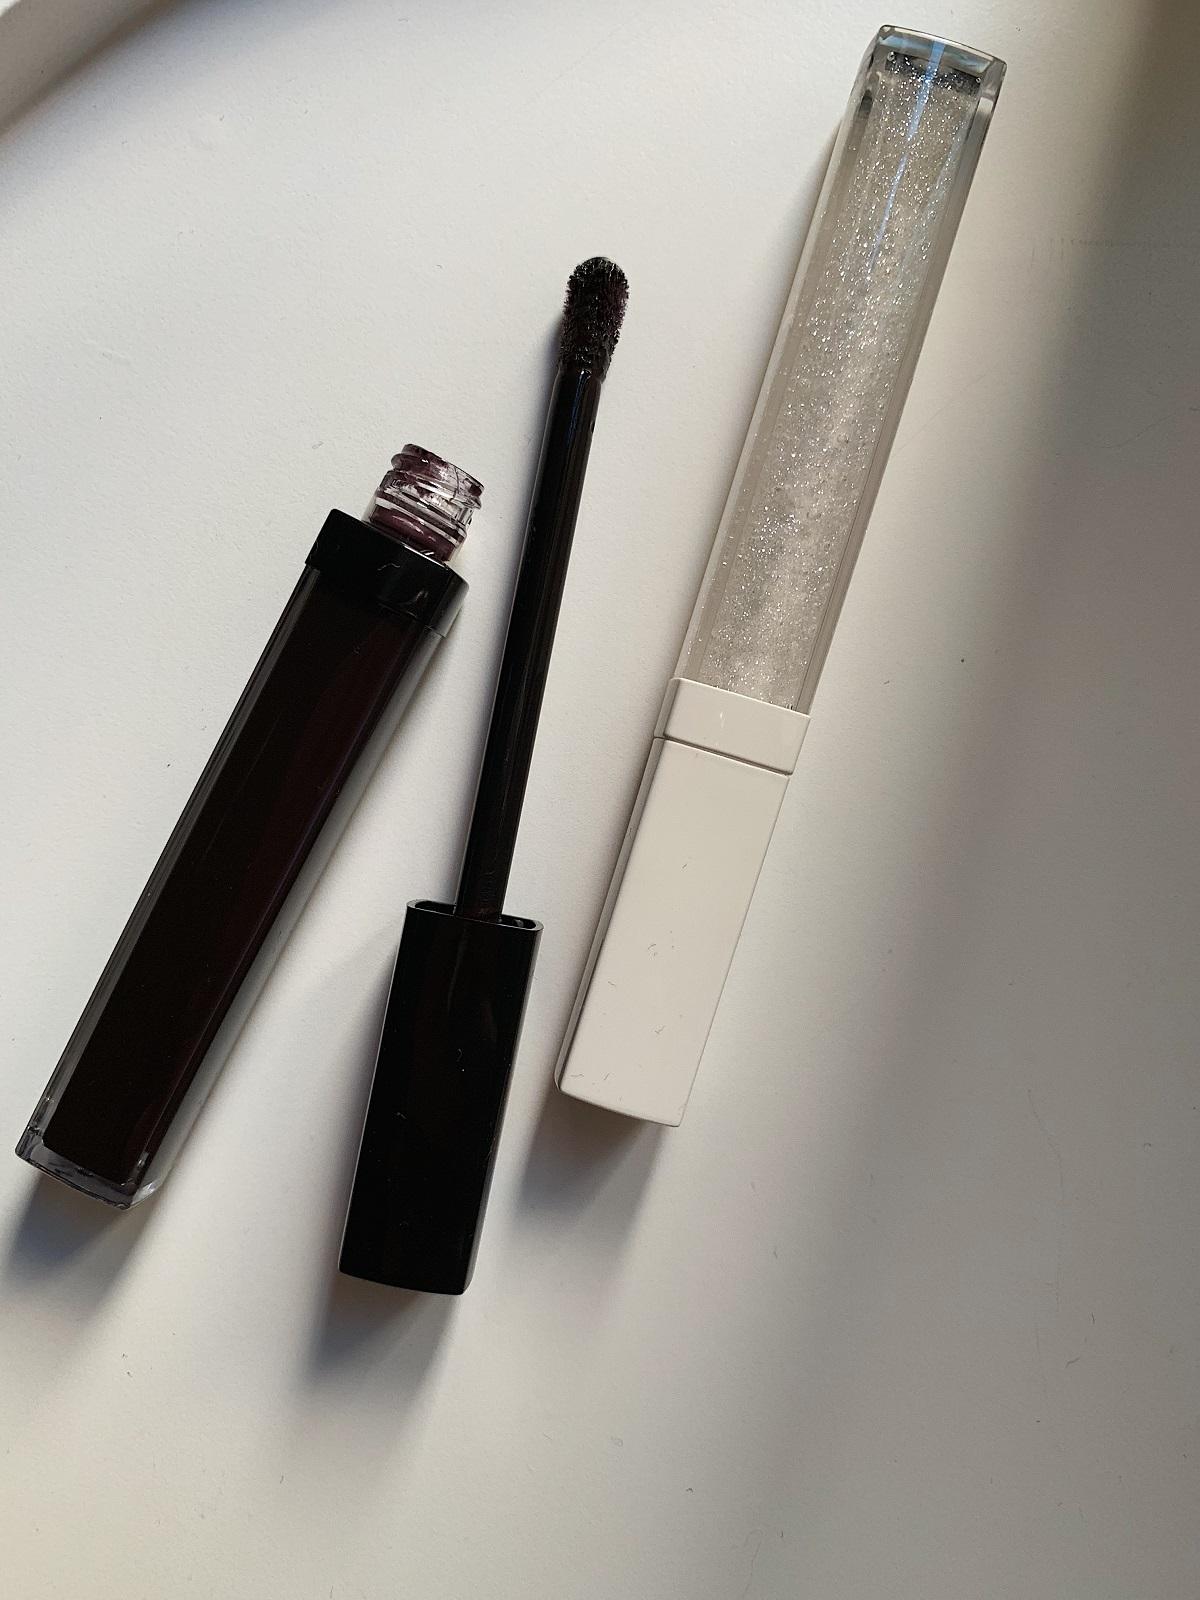 chanel products Noir et Blanc Chanel (8)